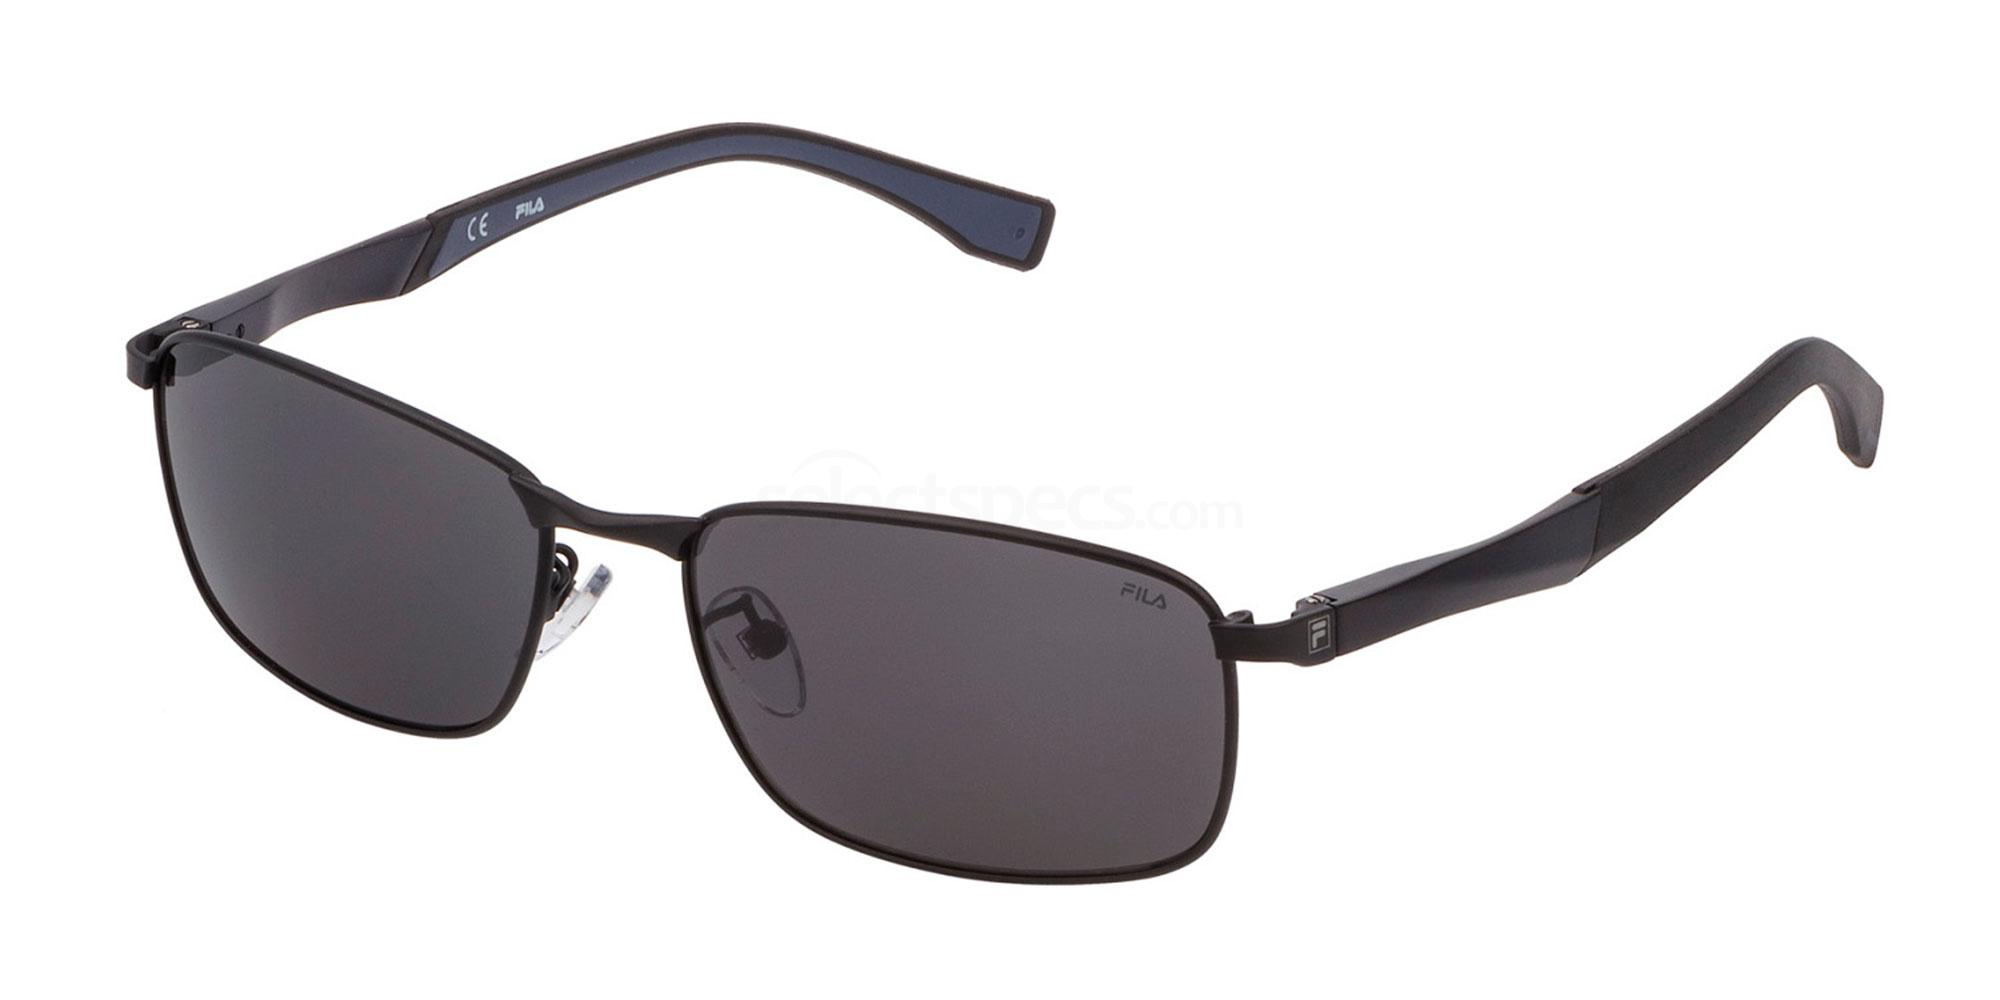 0531 SF9923 Sunglasses, Fila